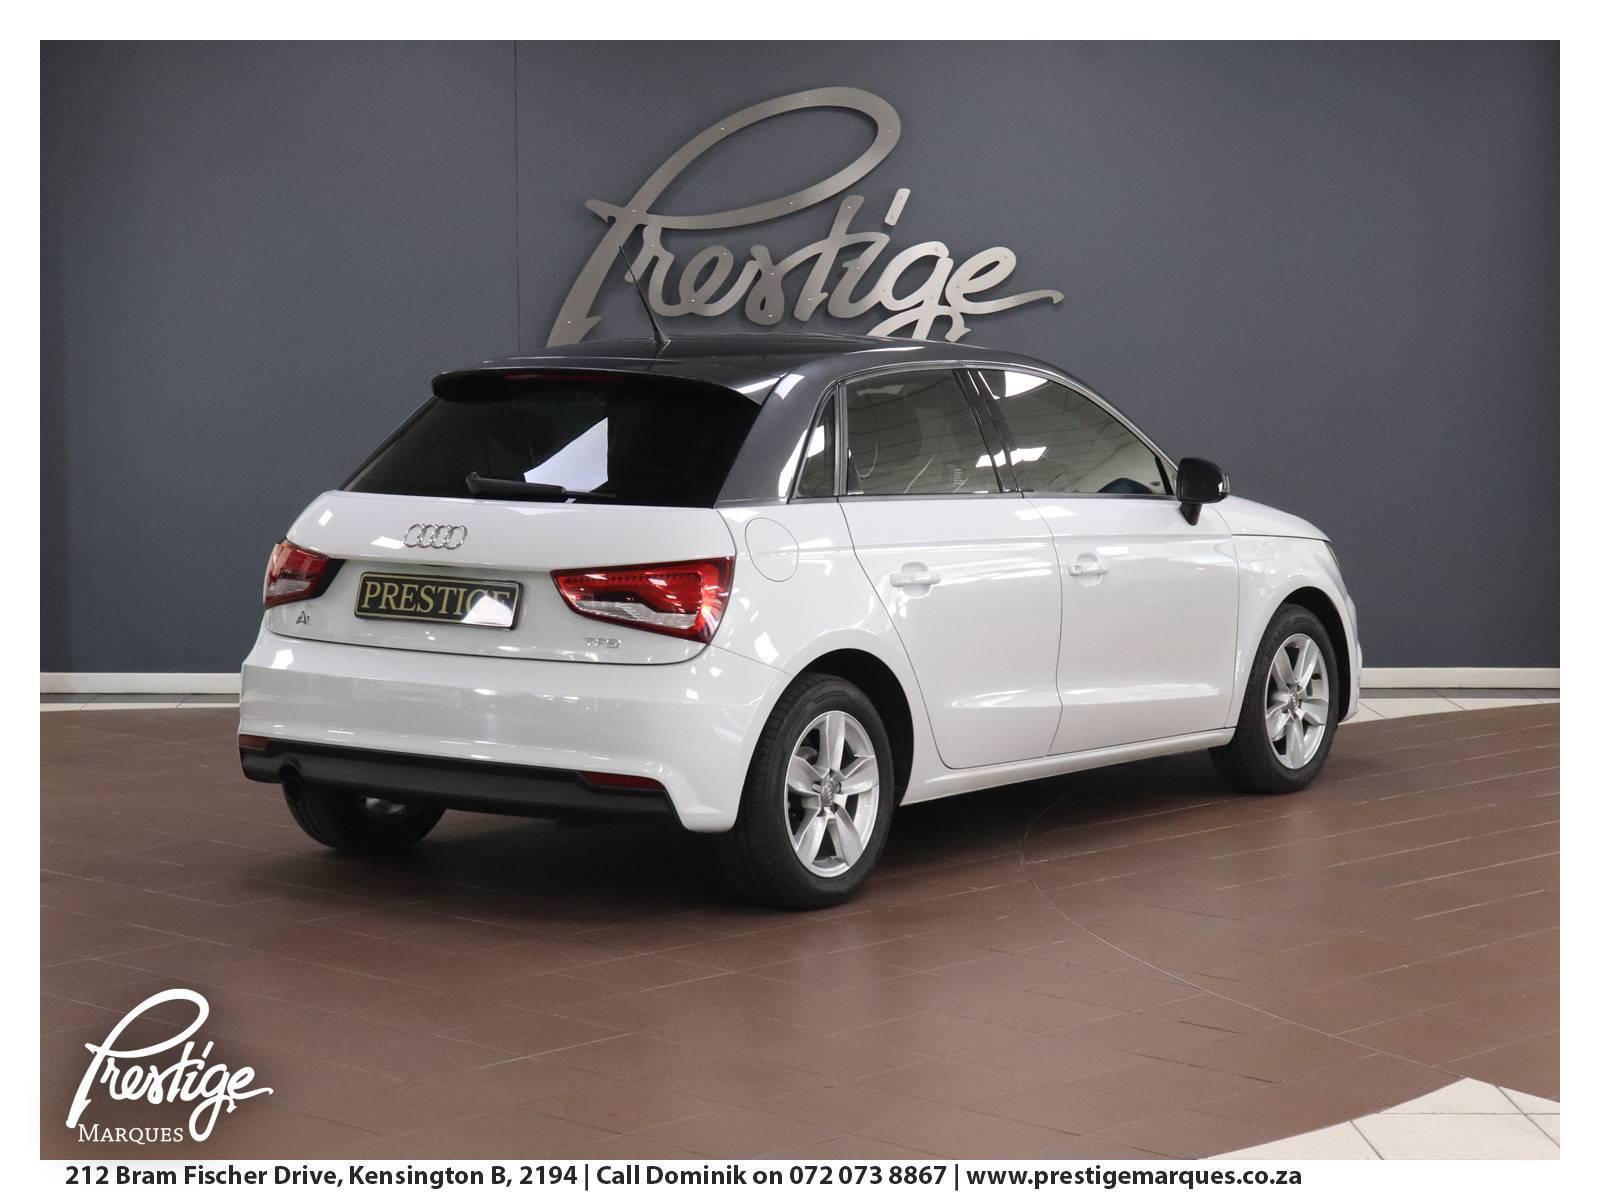 2015-Audi-A1-Prestige-Marques-Randburg-Sandton-3